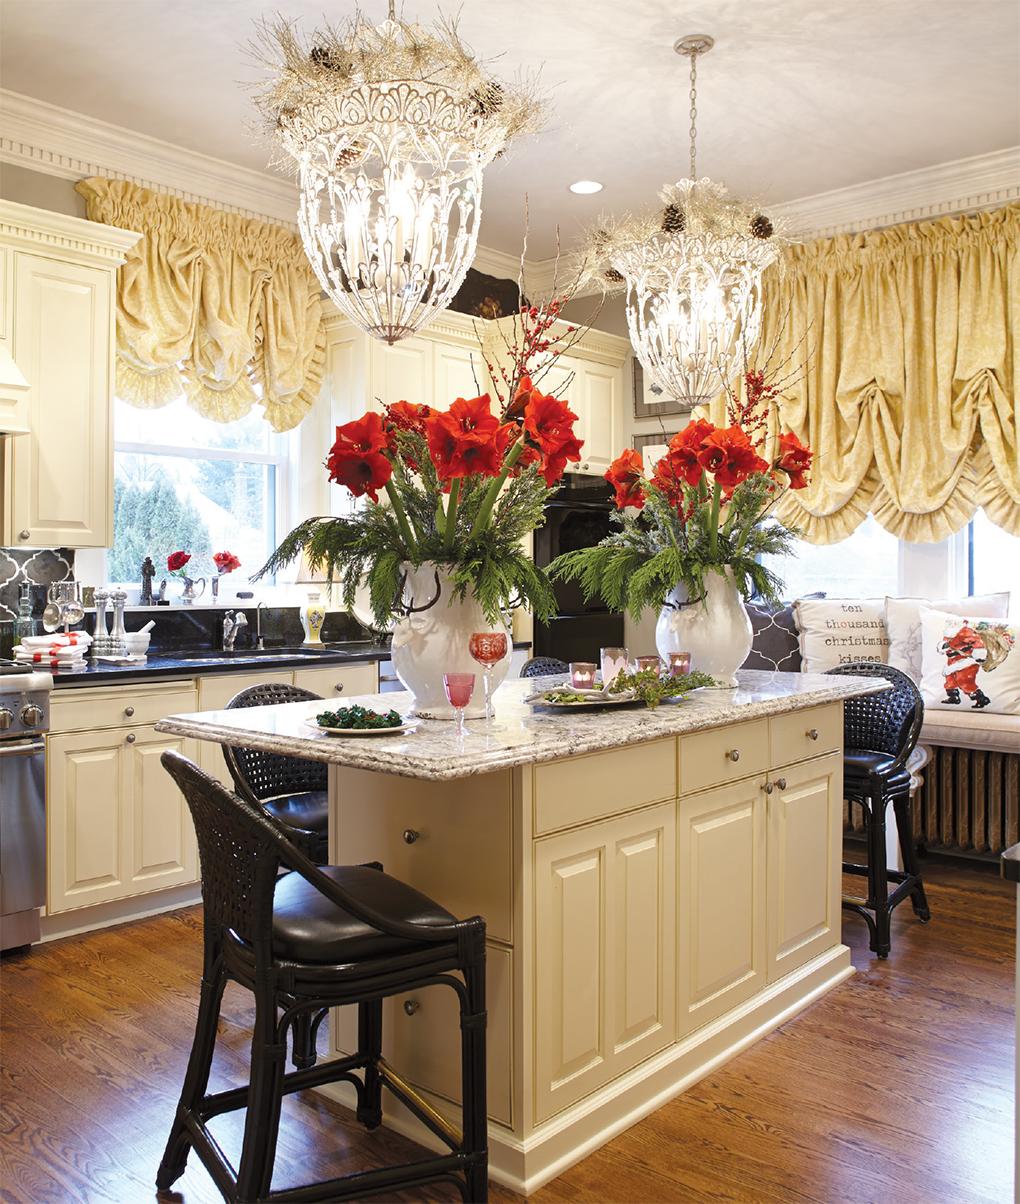 White kitchen with festive countertops